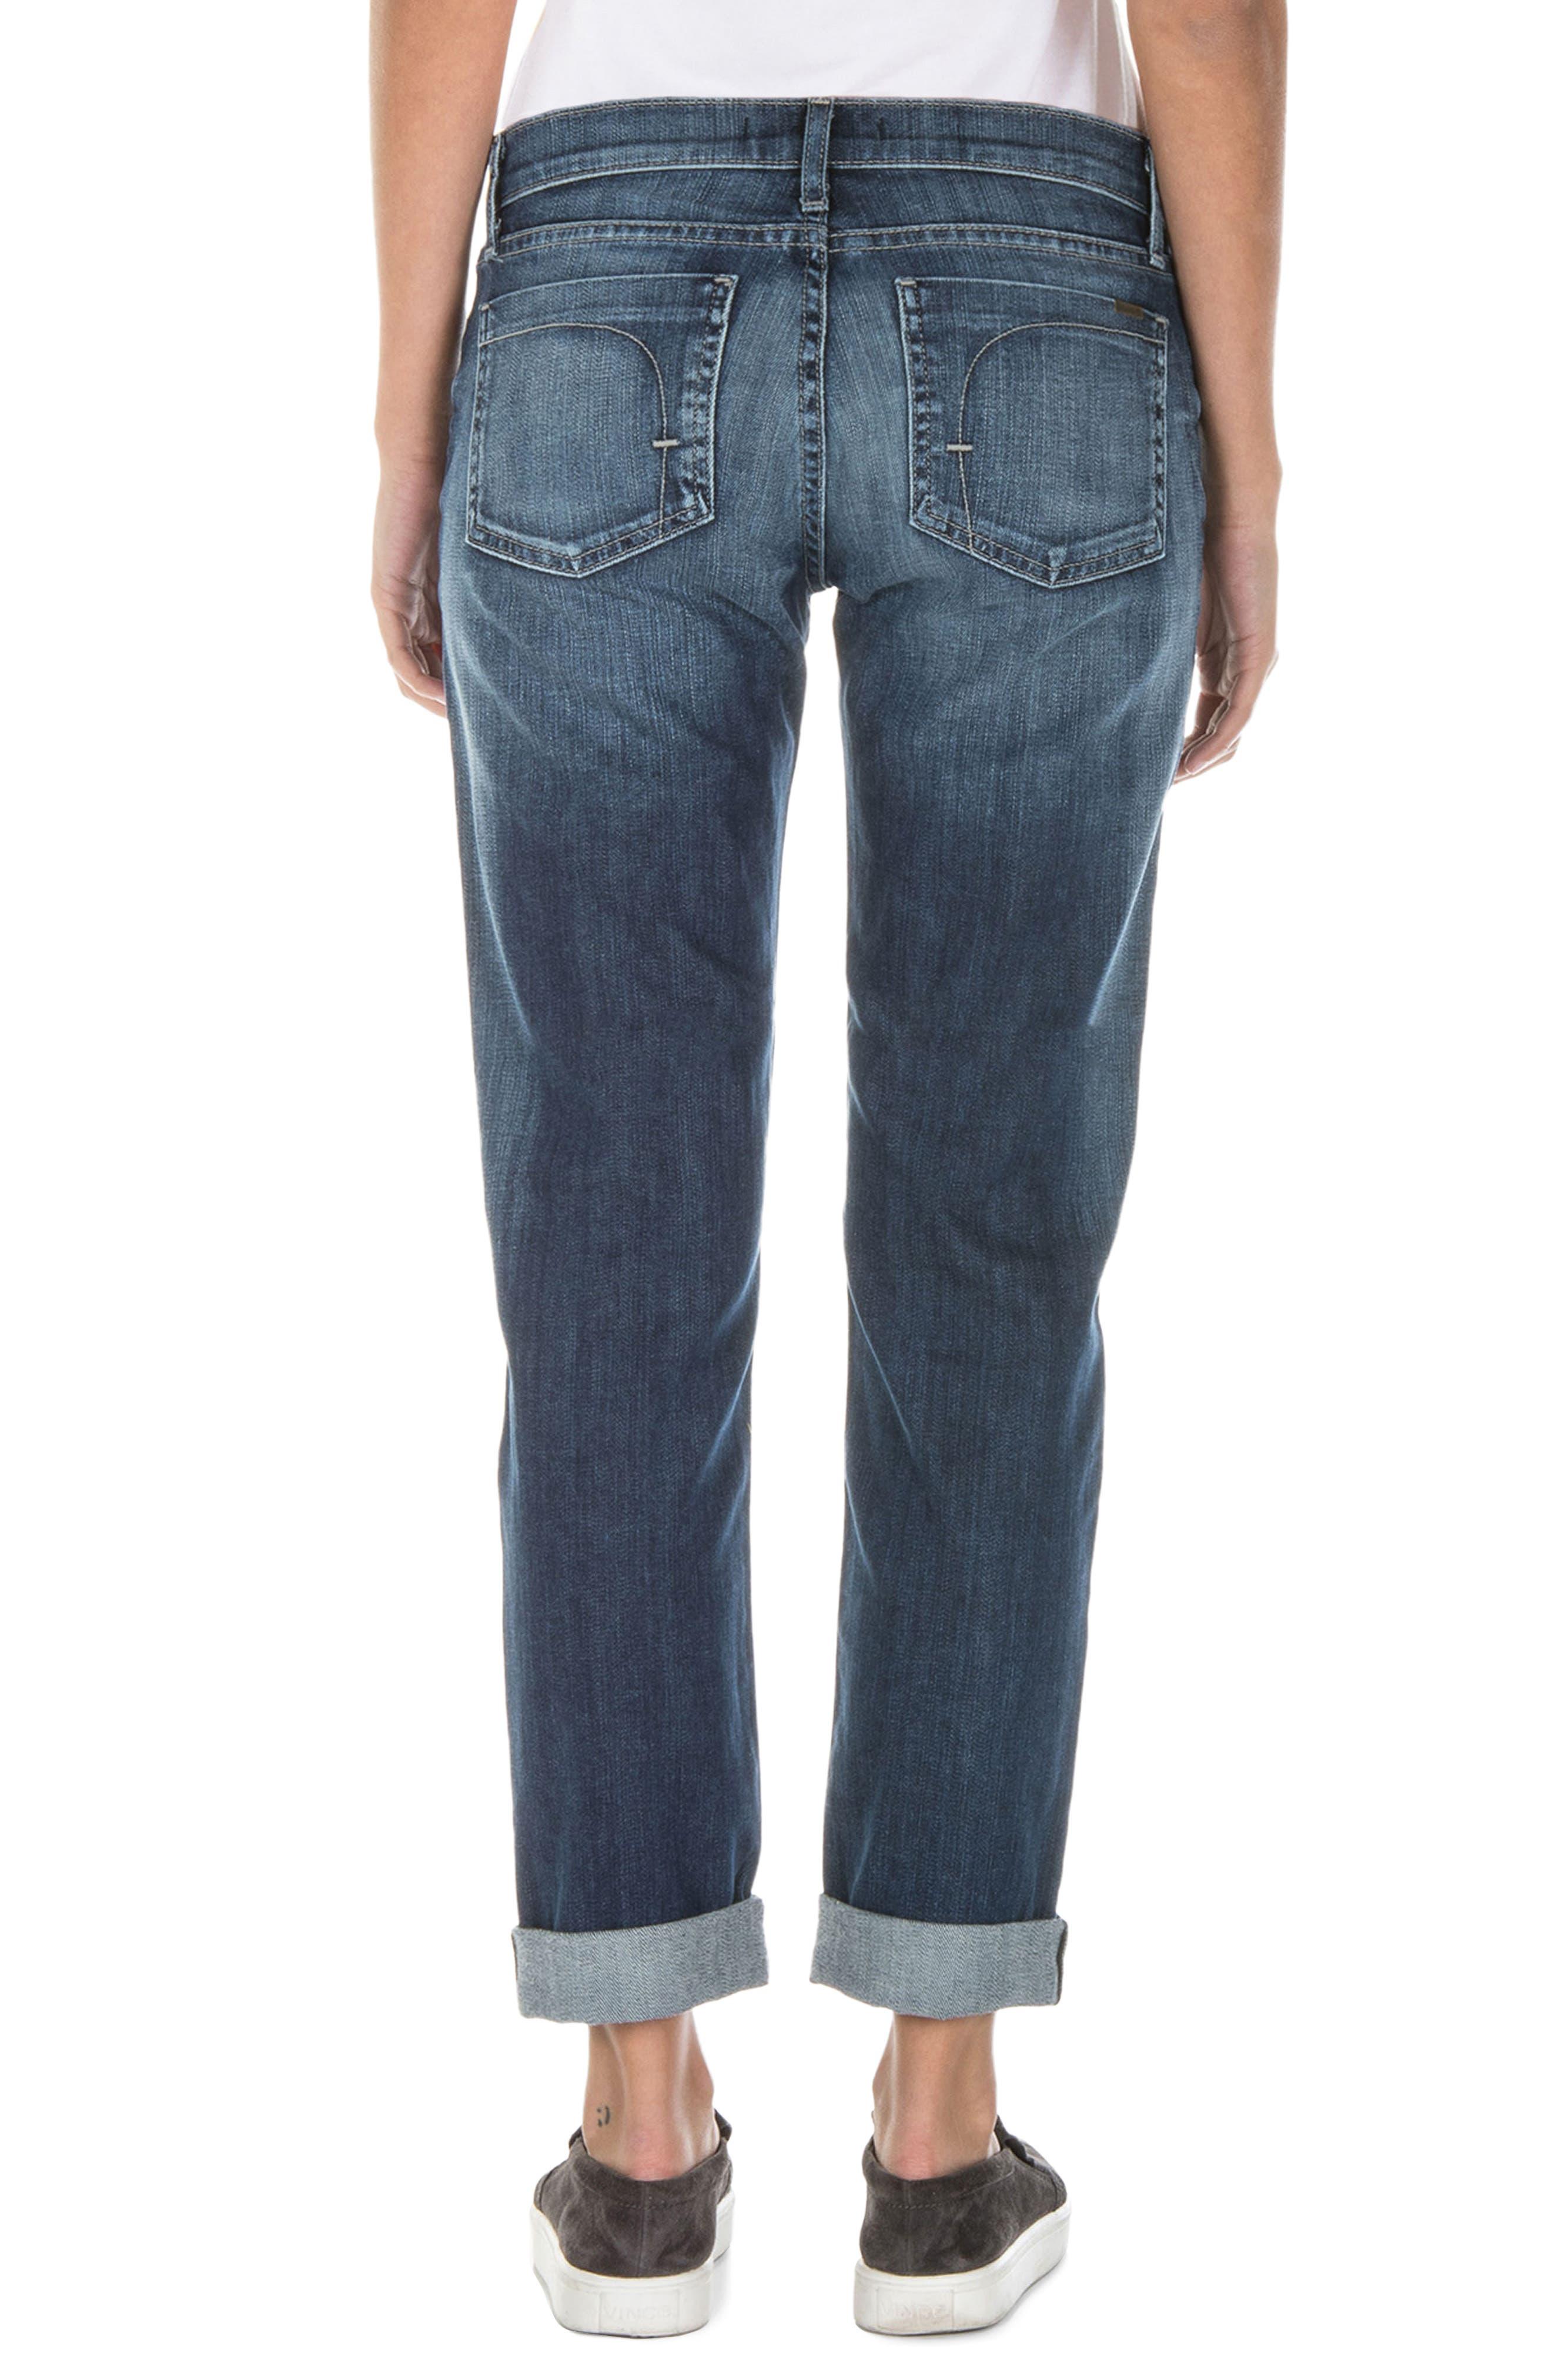 Alternate Image 3  - Fidelity Denim Axl Girlfriend Jeans (Exile Vintage)